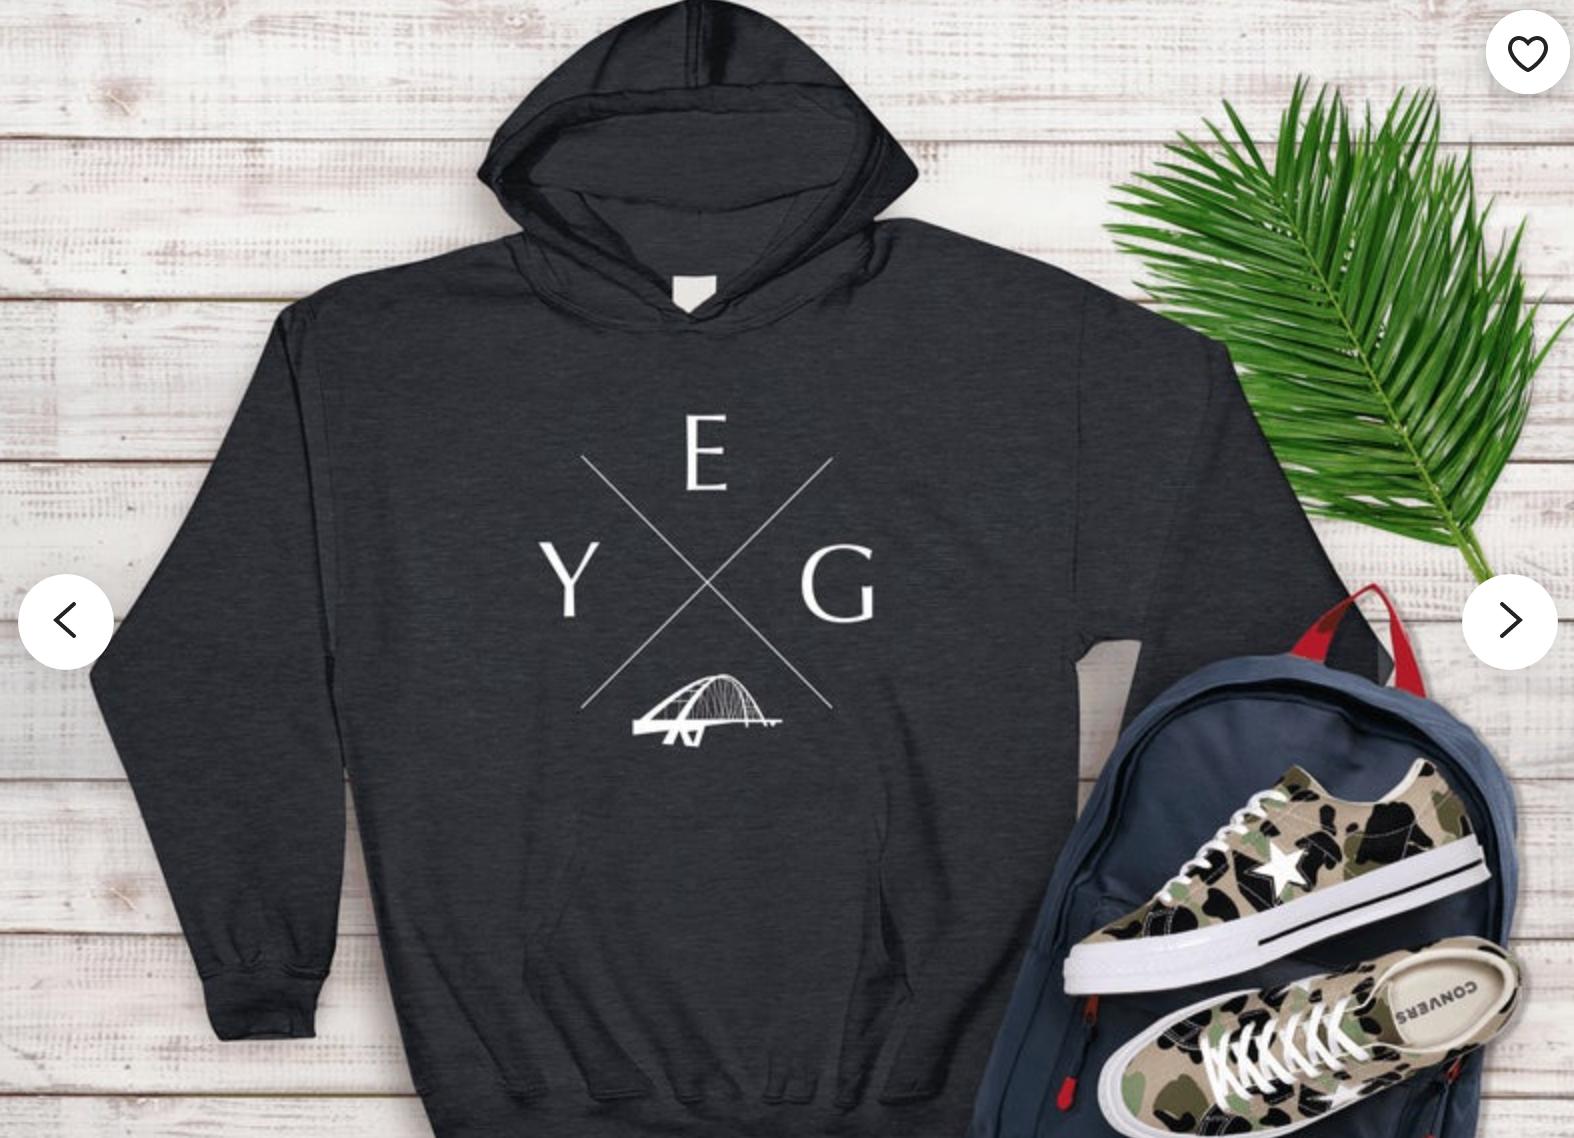 YEG sweater